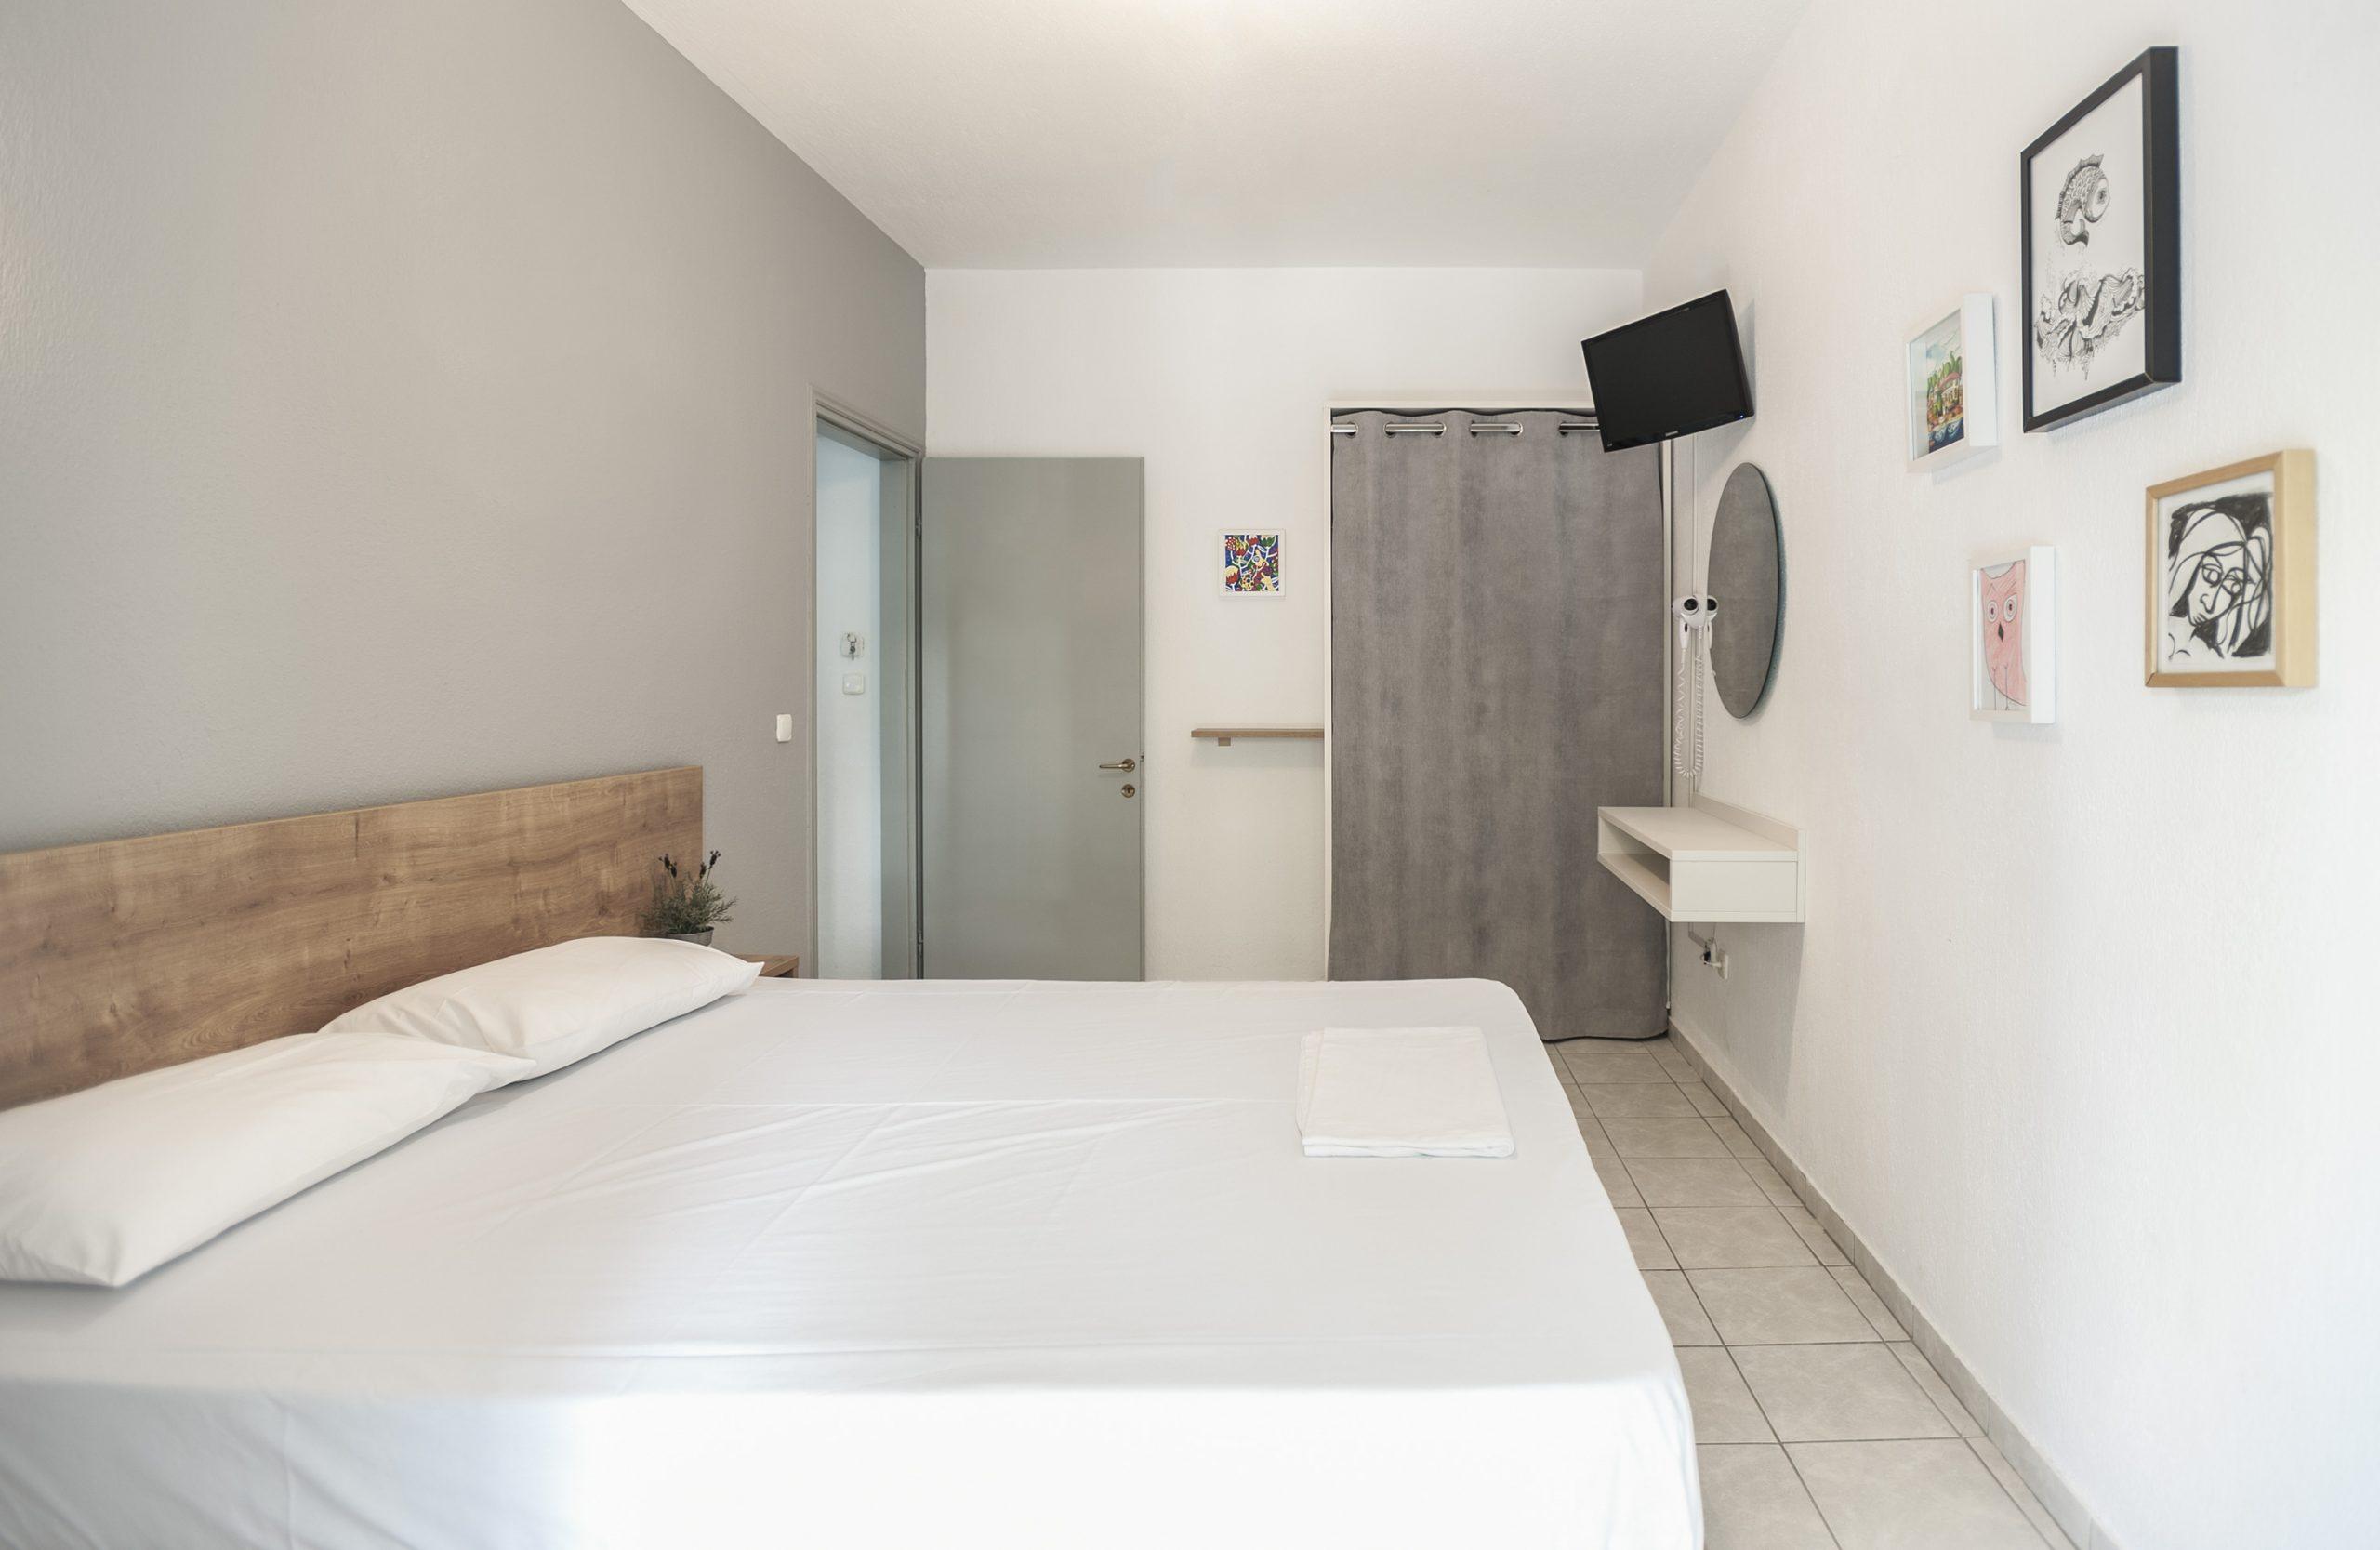 Afkos_rooms_020-1